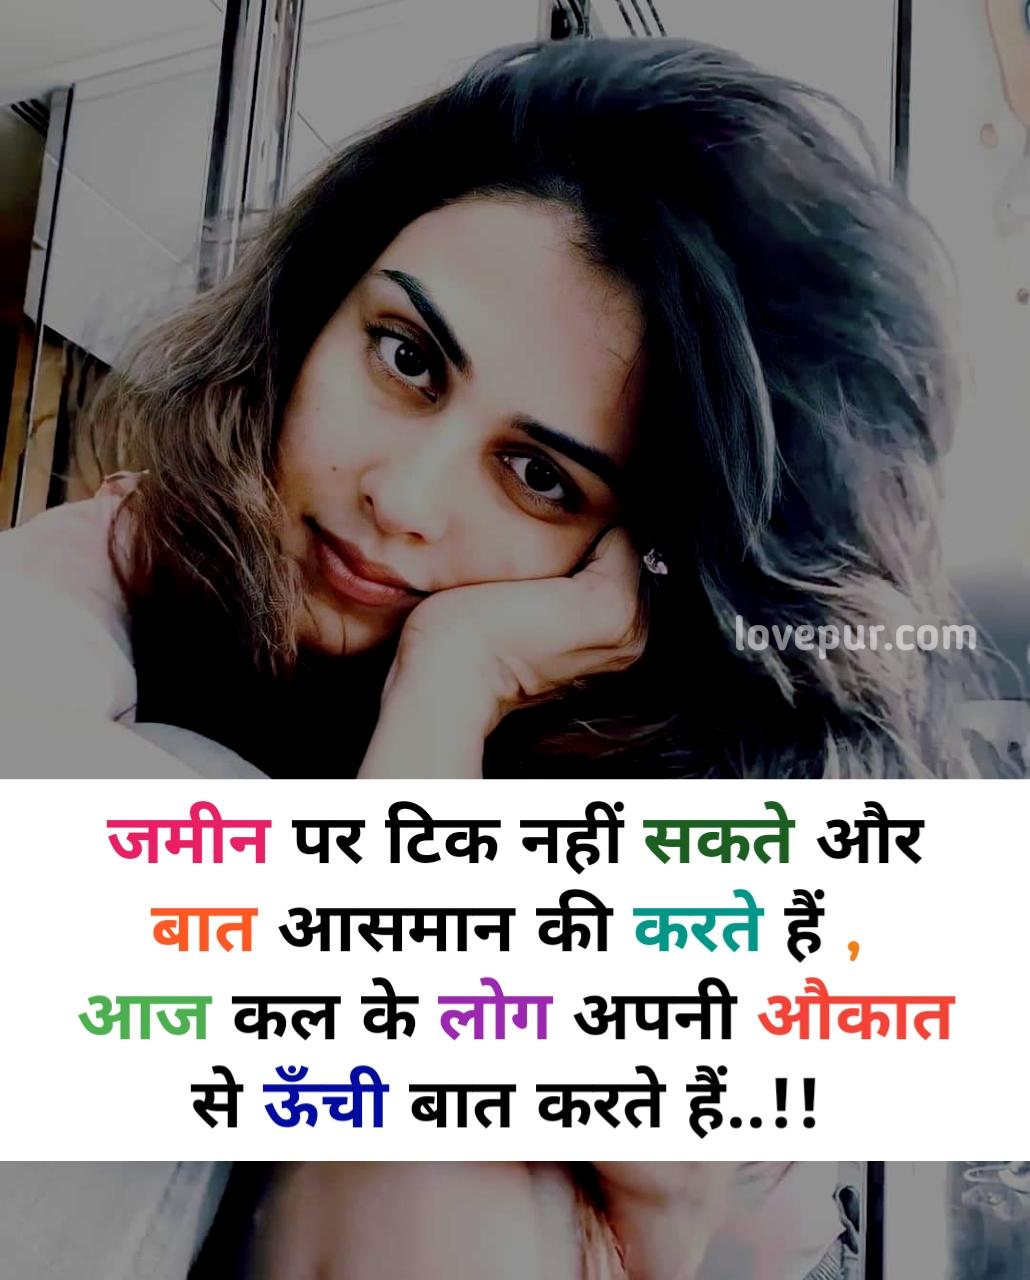 Attitude Status for Girl in Hindi | Royal स्टेटस इन हिंदी for girl